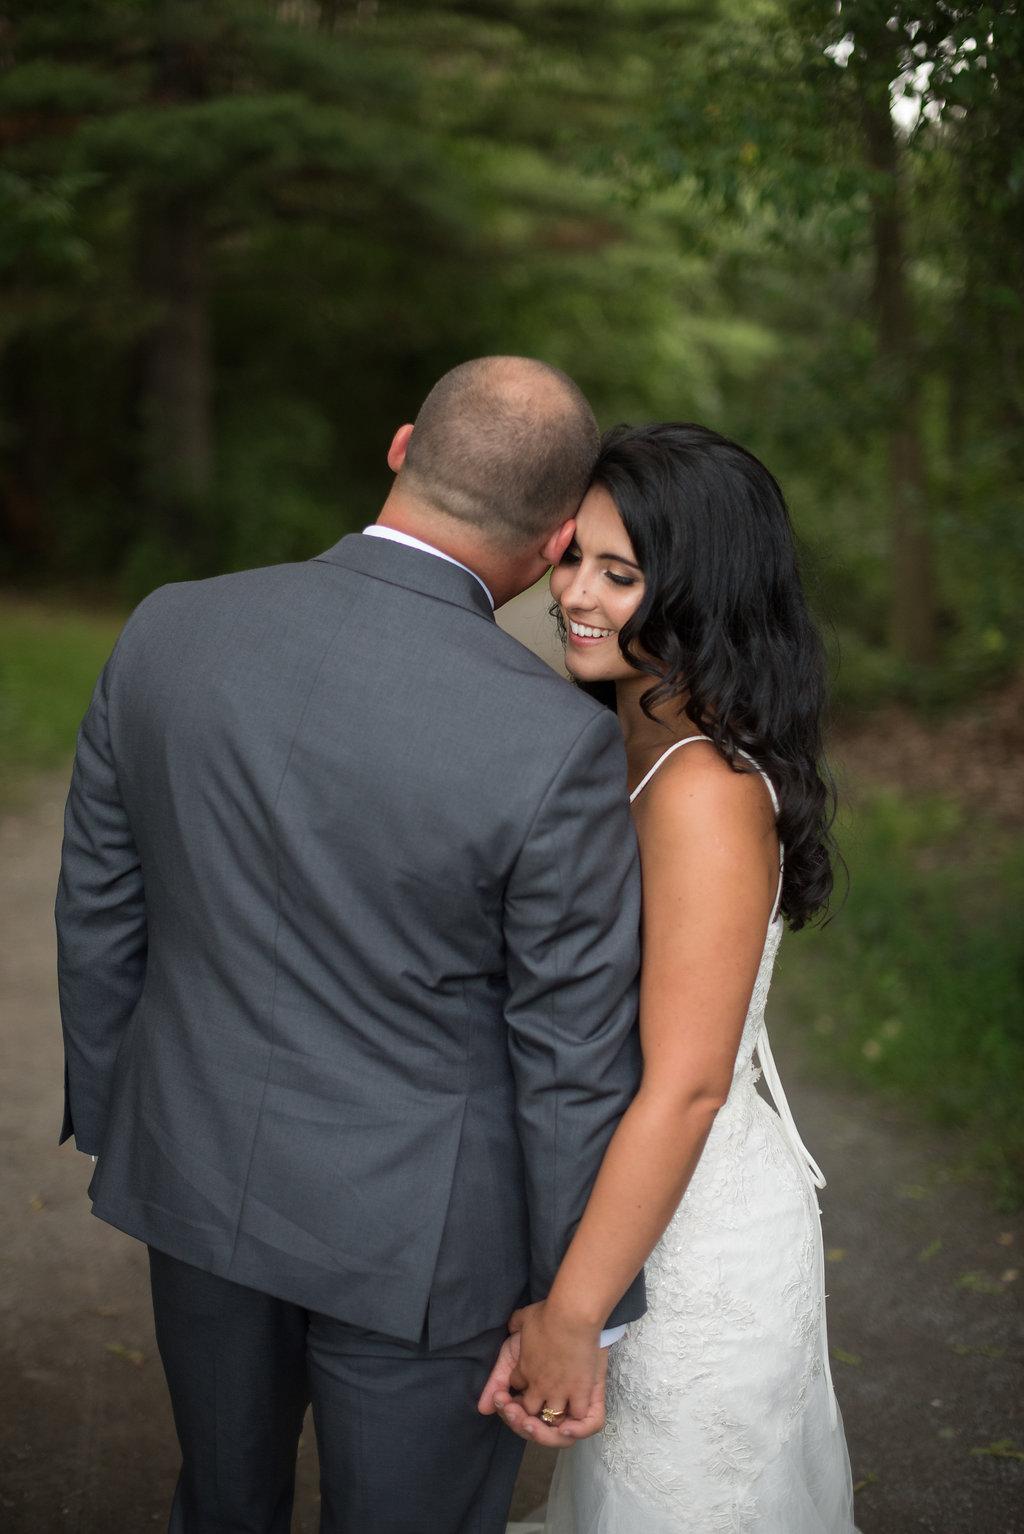 vermont wedding photographer-bridepartyportraits-36.jpg